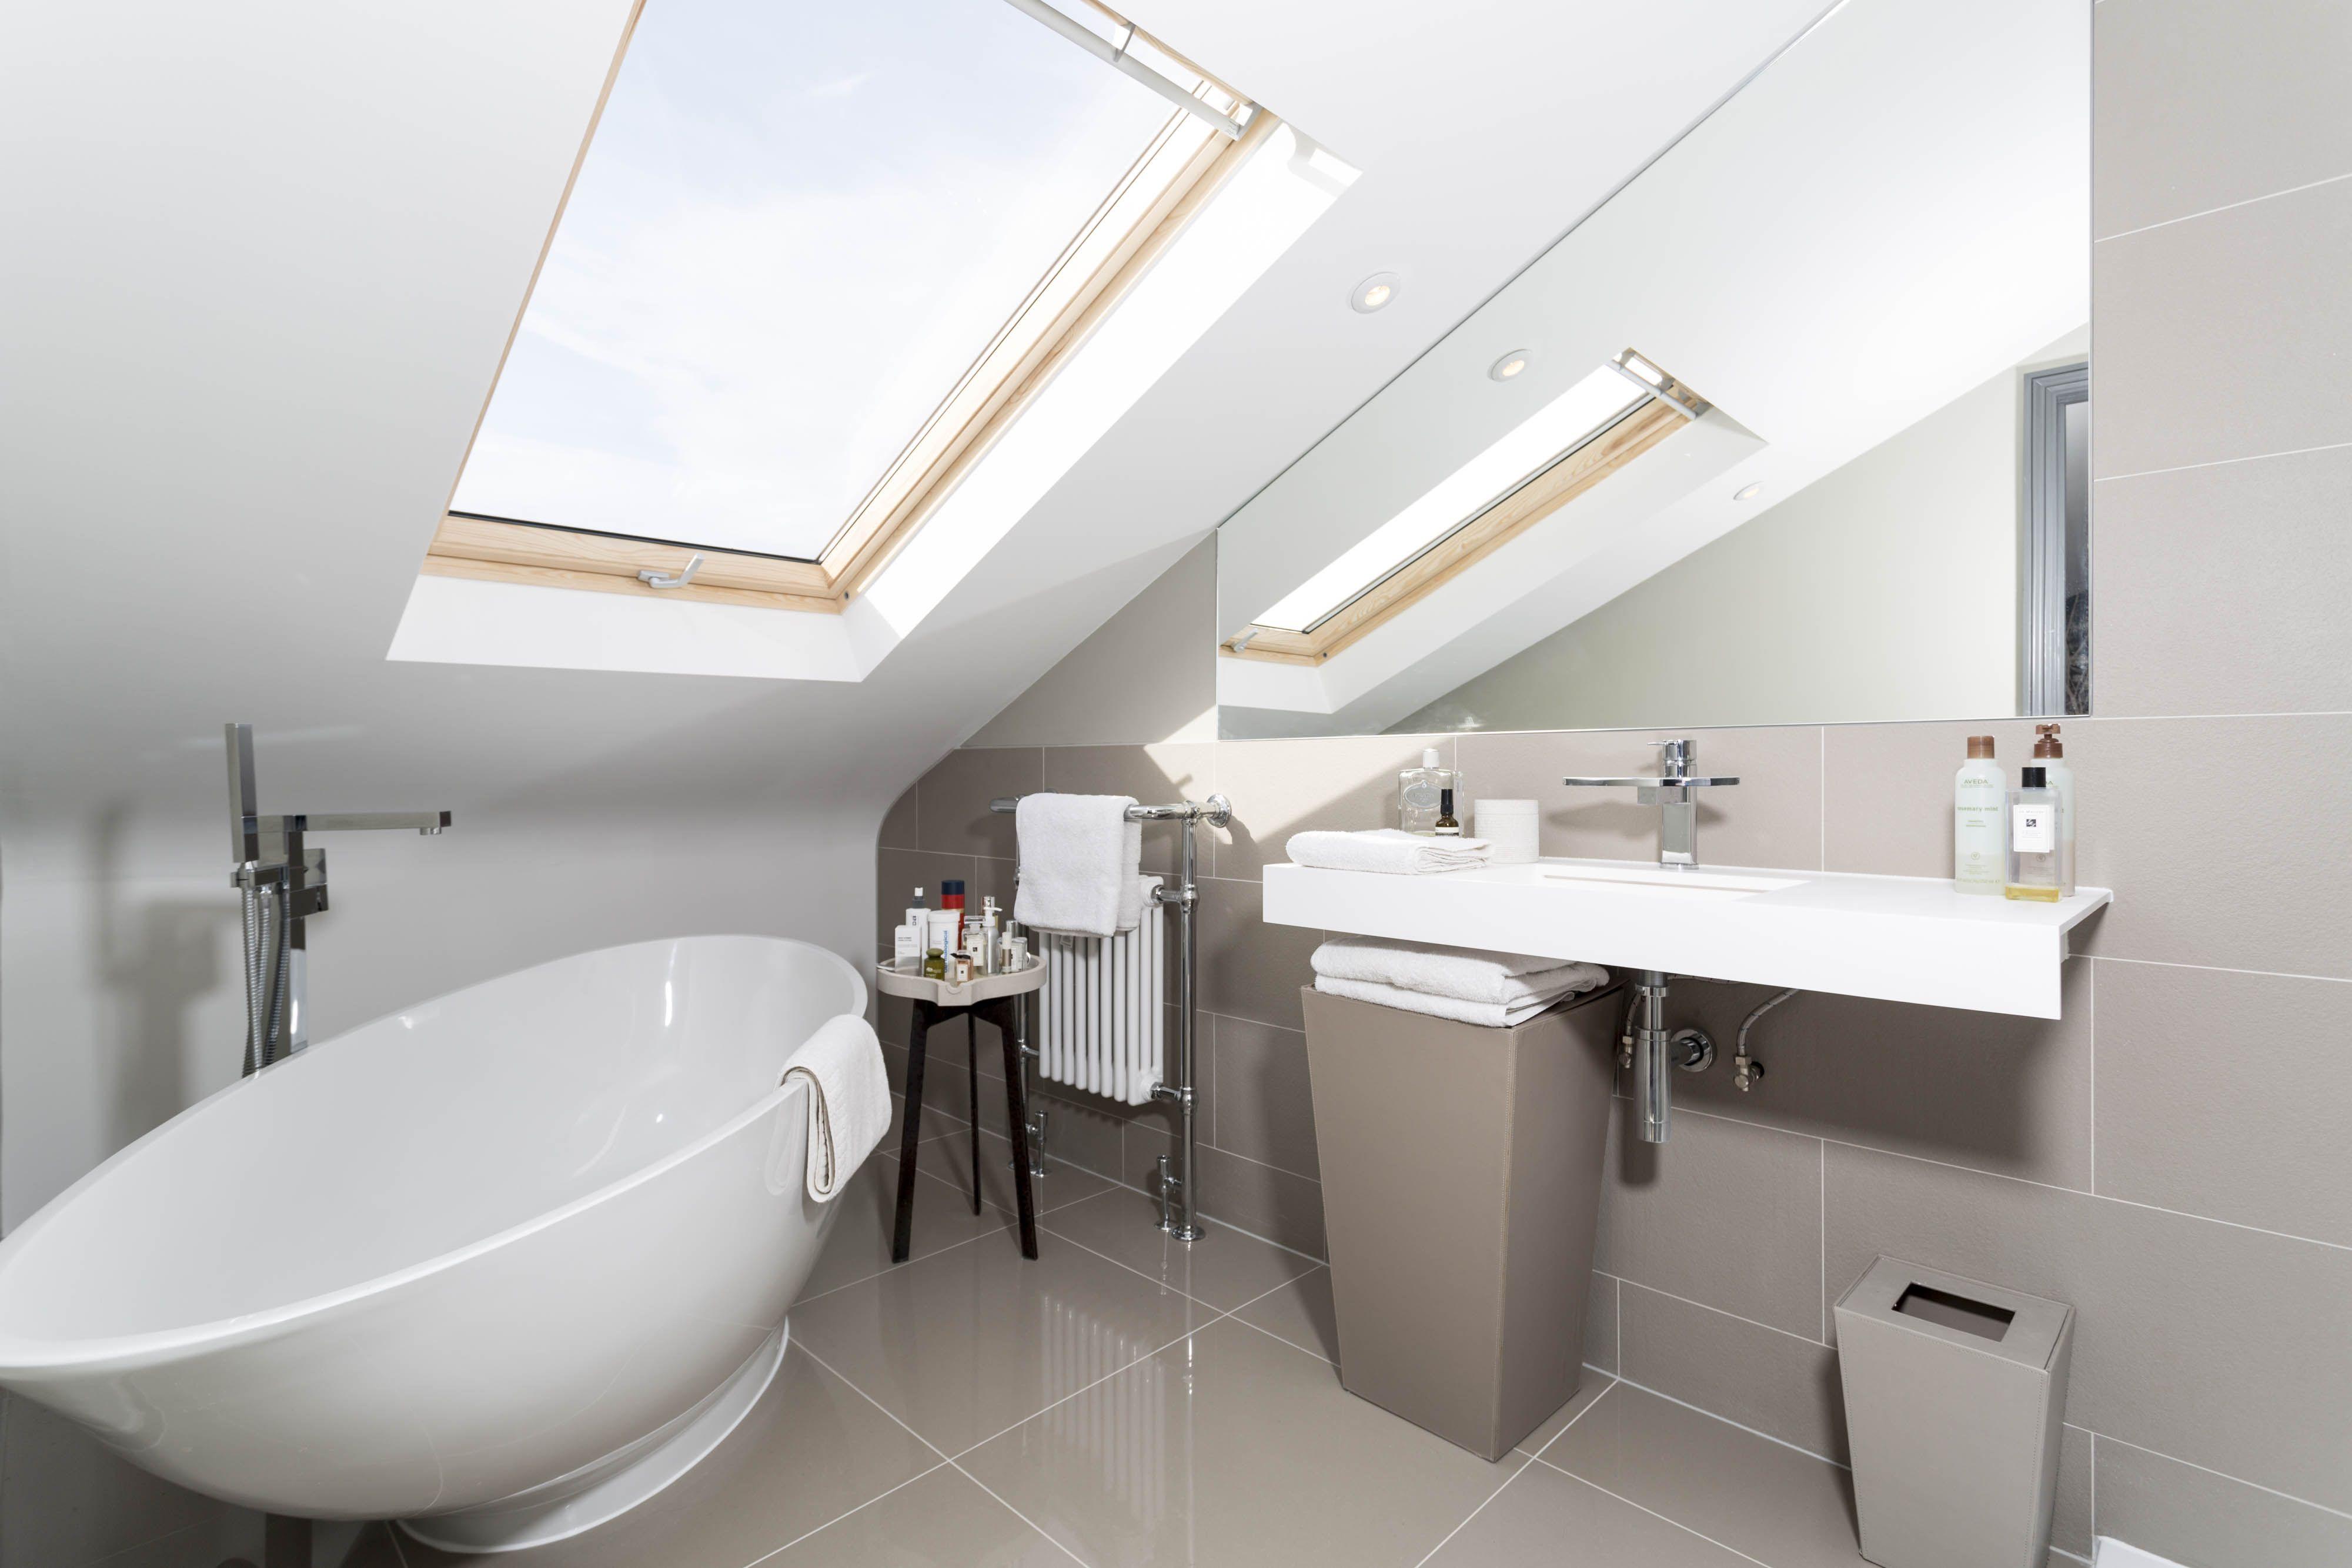 Grey Tiled Loft Conversion Bathroom With Beautiful Free